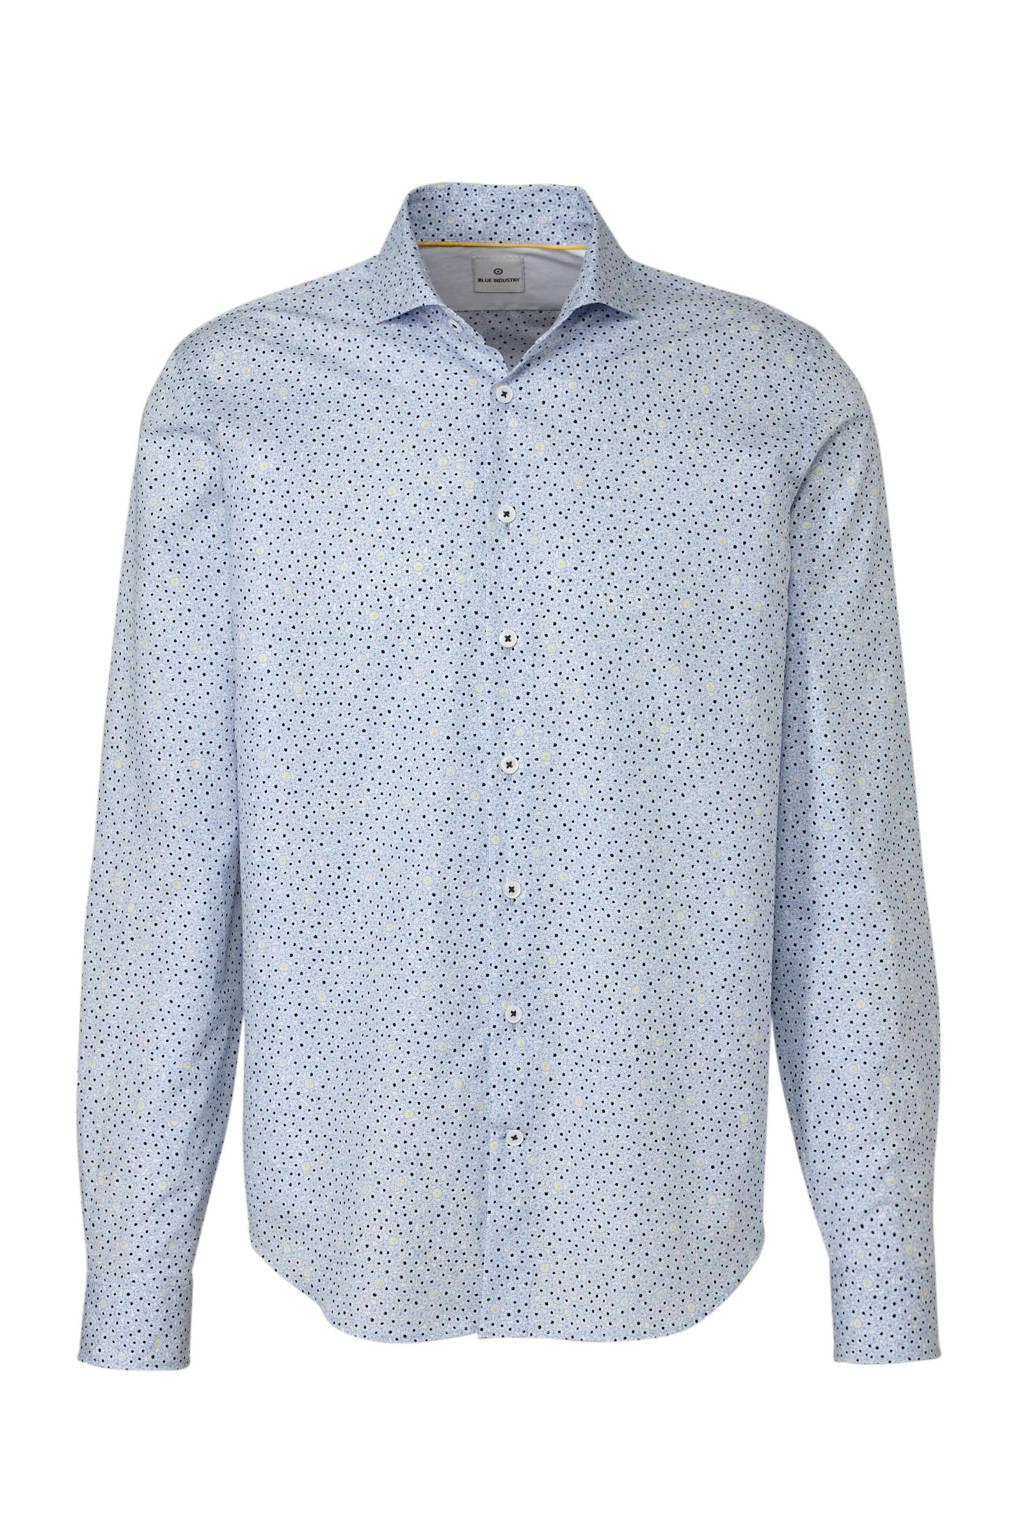 Blue Industry slim fit overhemd met print blauw, Blauw